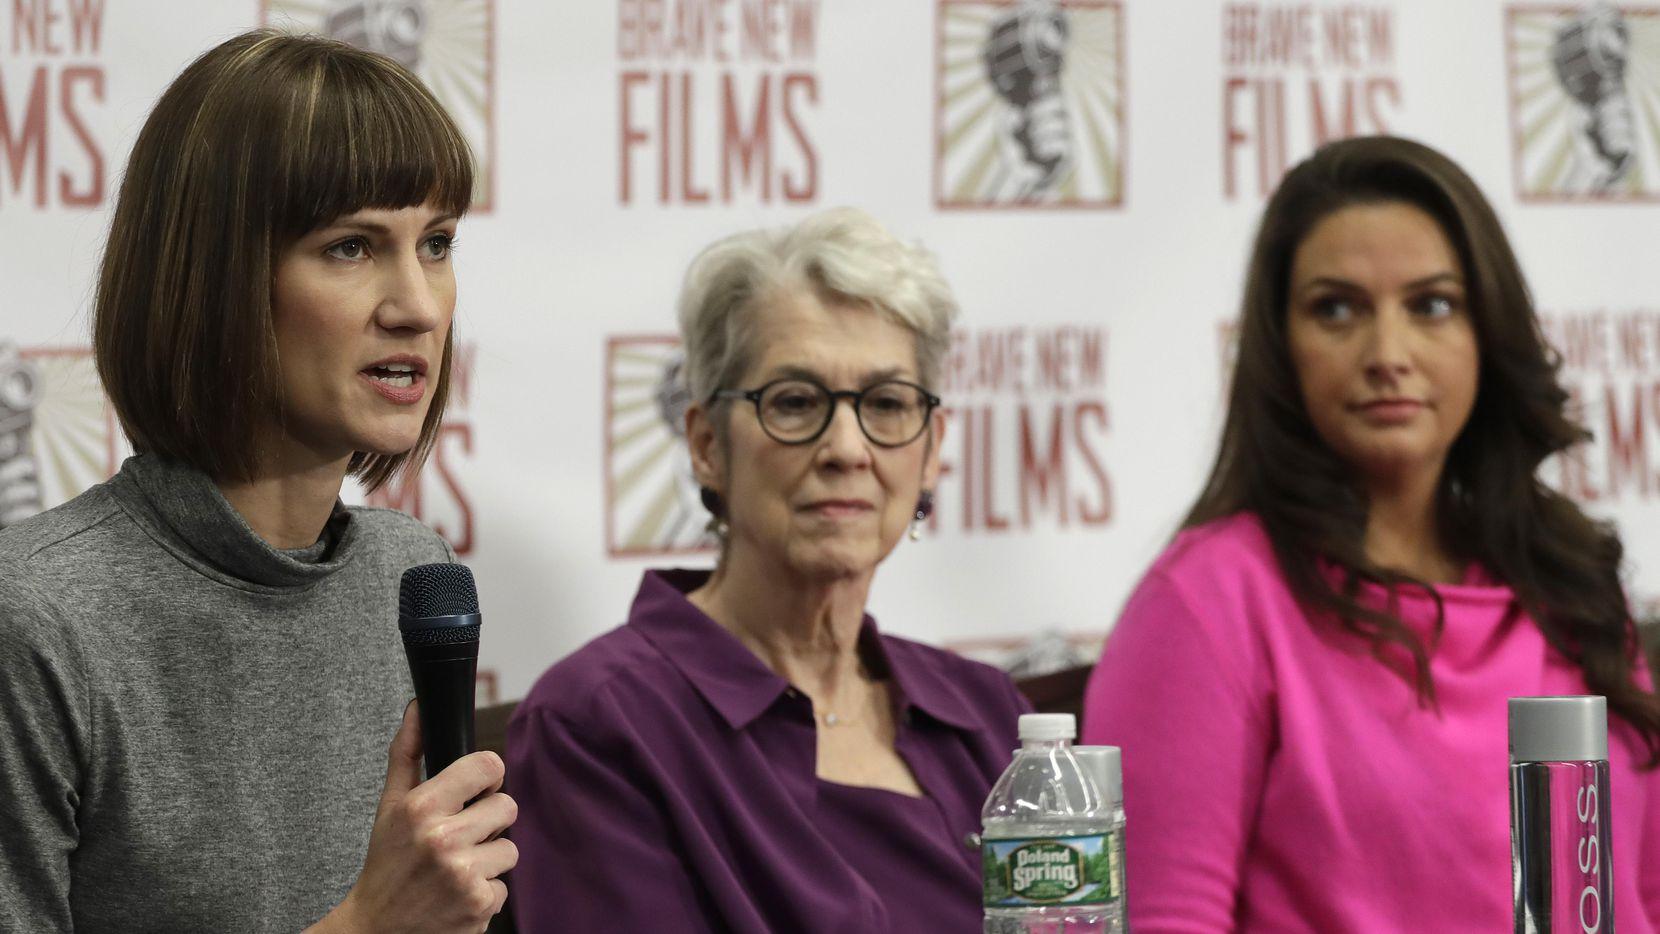 Rachel Crooks, Jessica Leeds y Samantha Holvey, mujeres que acusan a Donald Trump de acoso sexual.(AP)